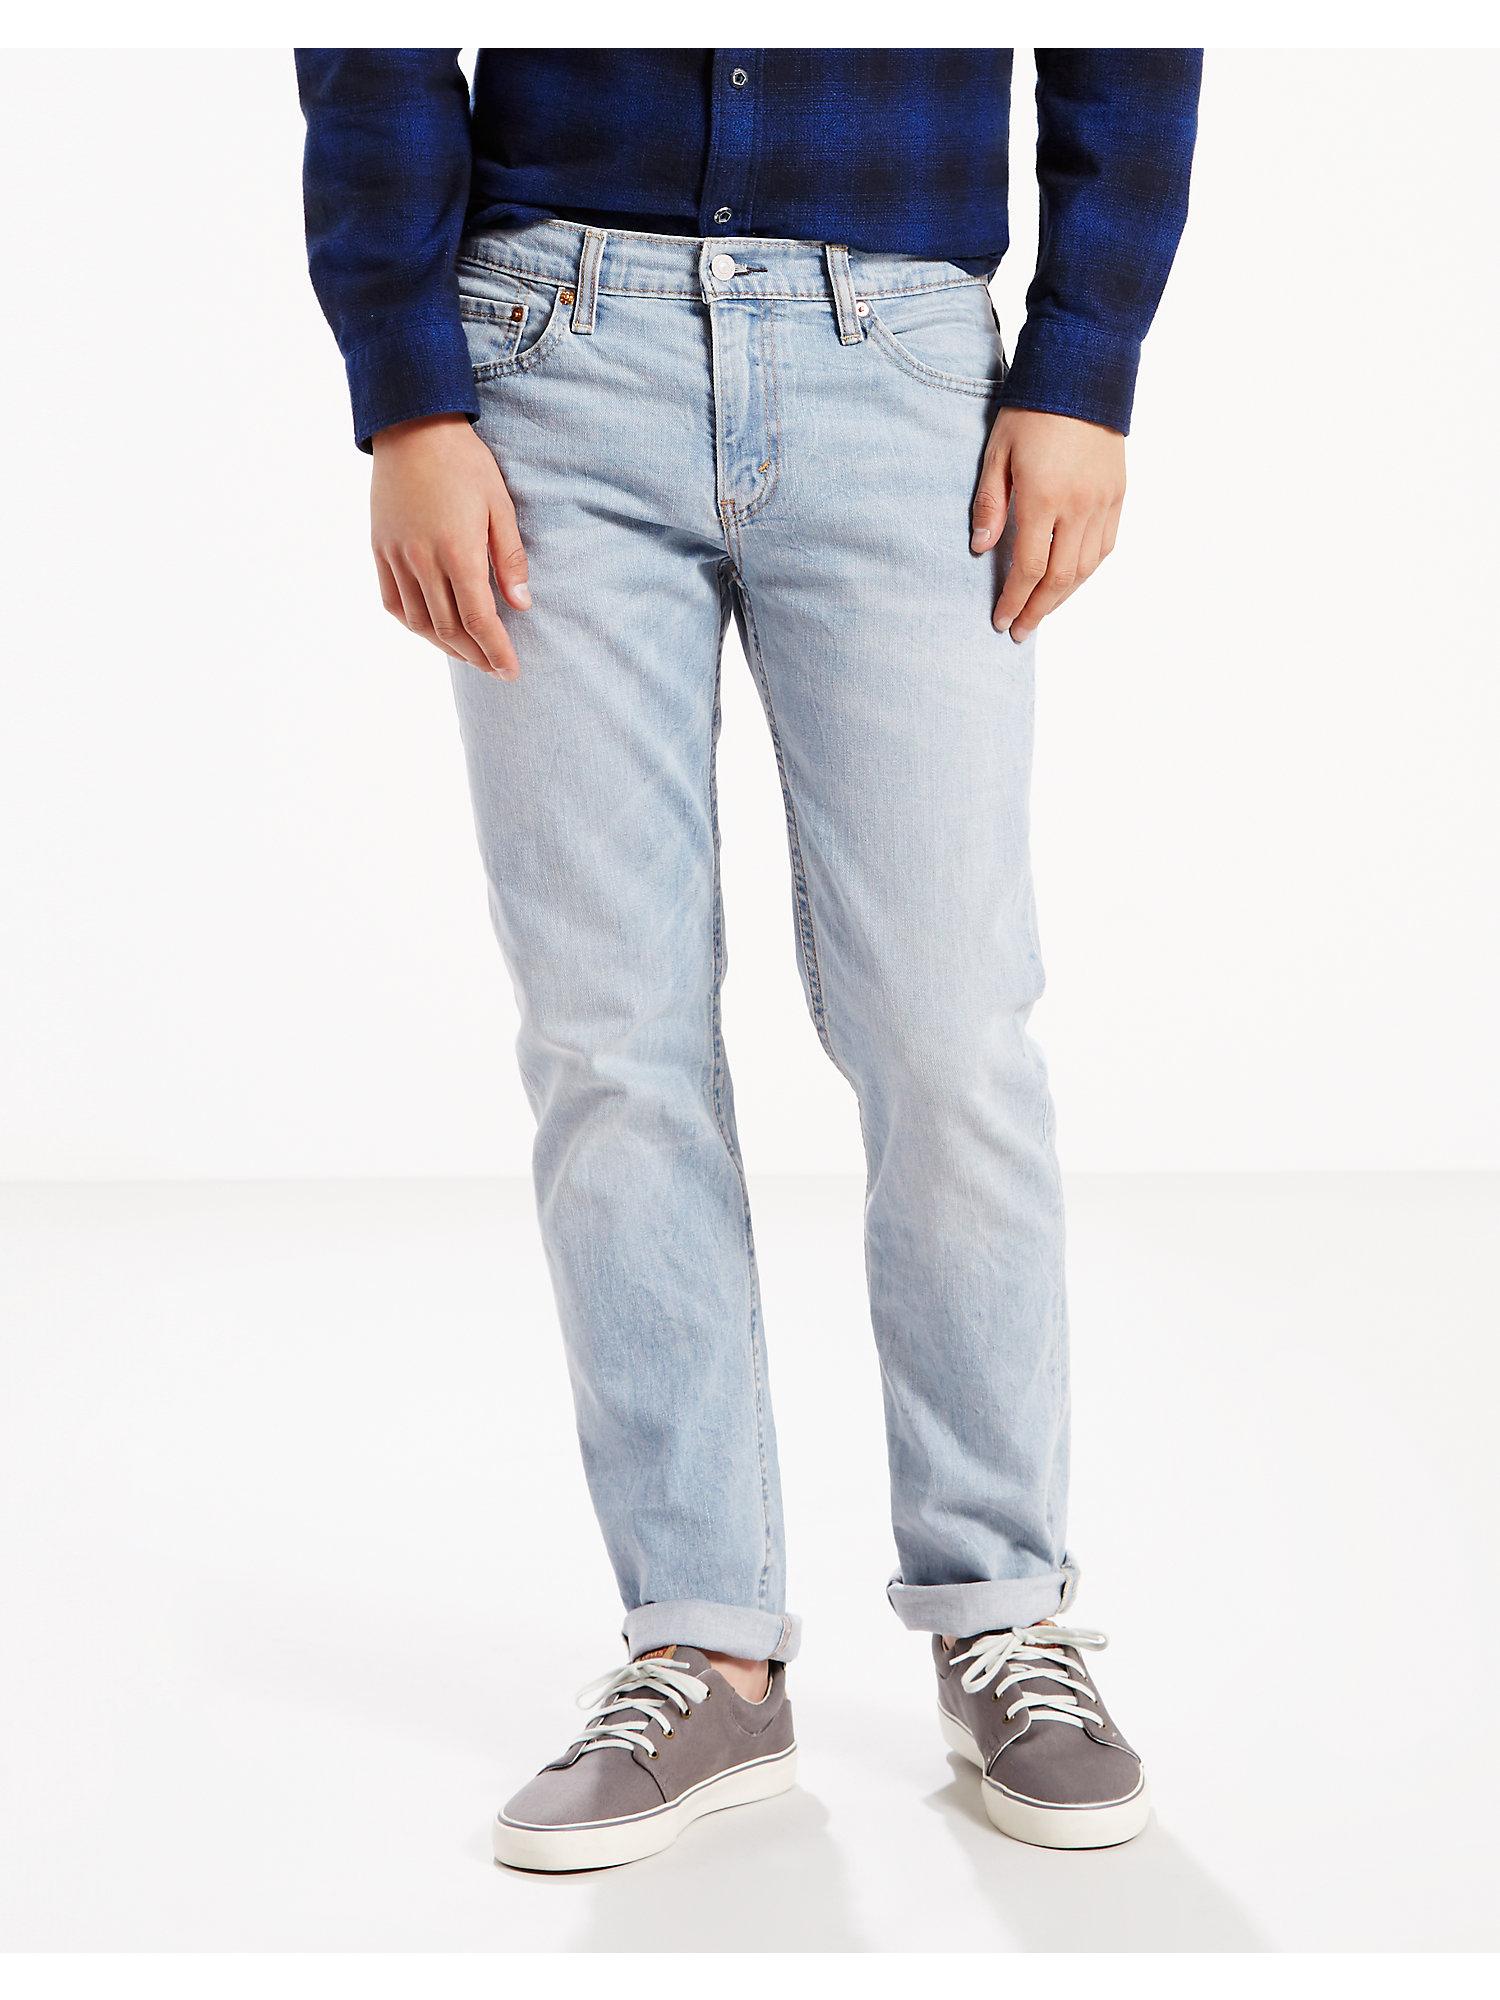 Levi/'S Men/'S 511 Slim Fit Jeans Stretch